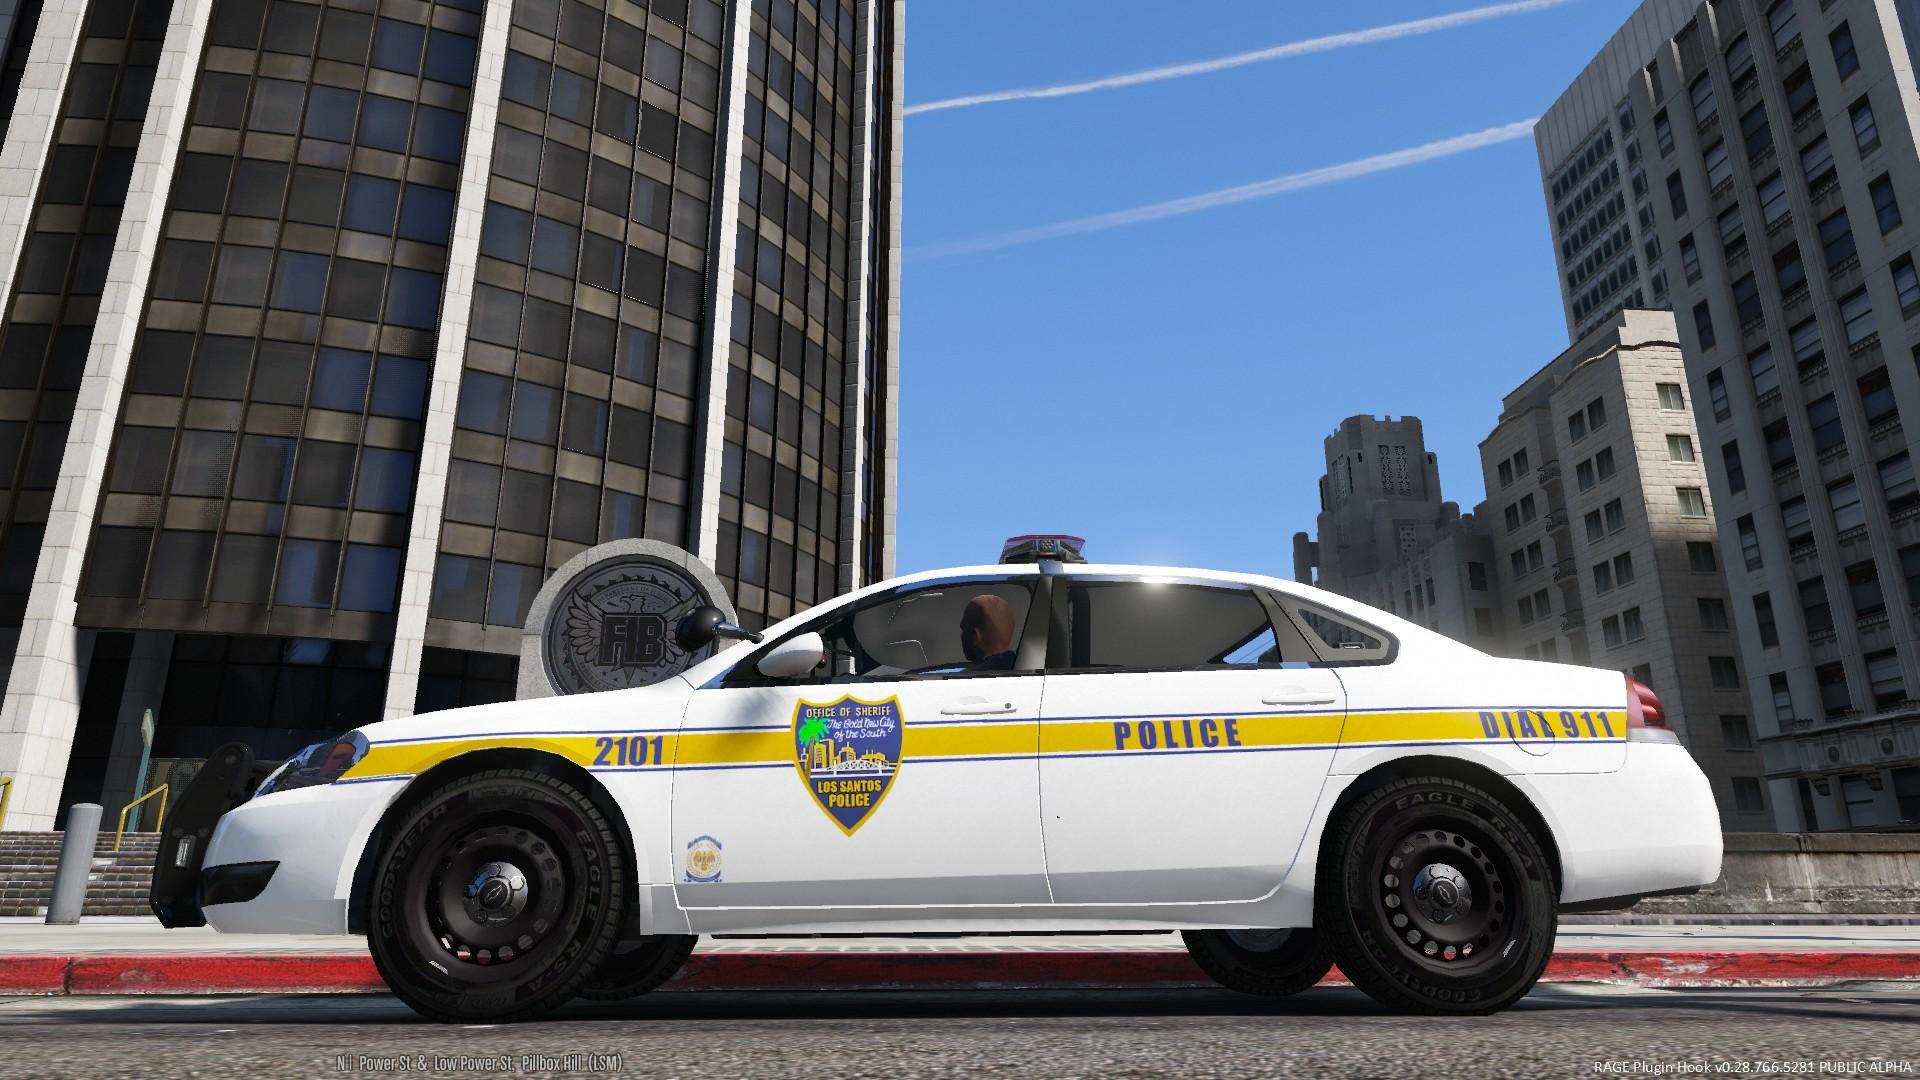 4k Impala Lspd Jacksonville Sheriff S Office Style